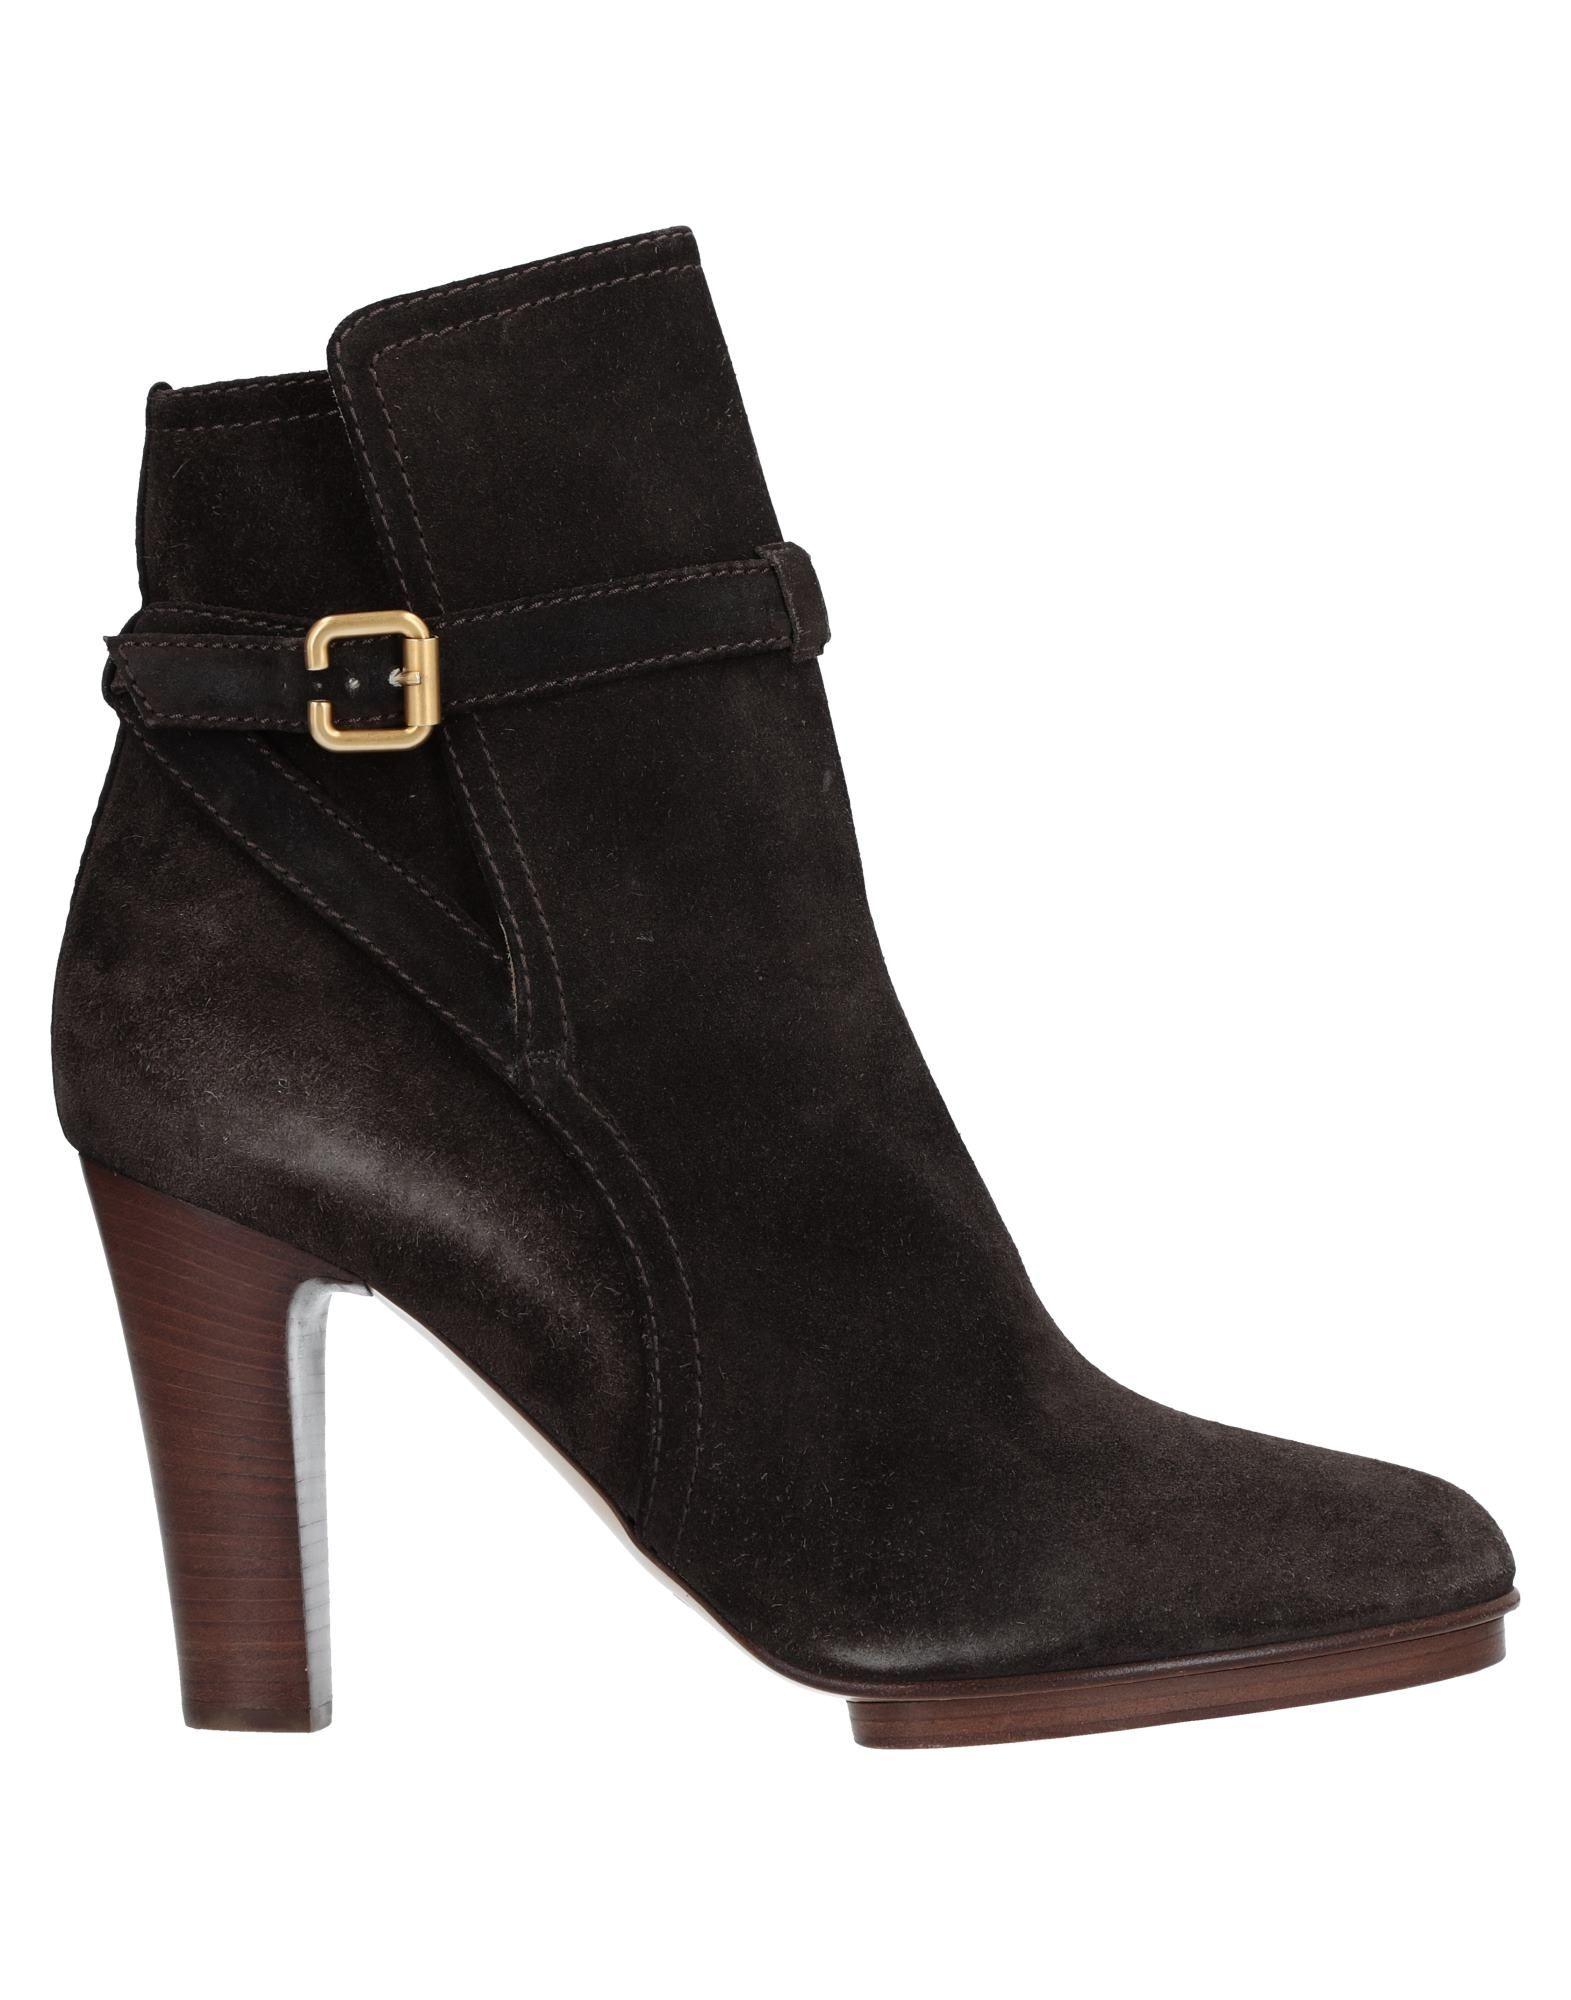 Haltbare Mode billige Schuhe Chloé Stiefelette Damen  11533521JH Heiße Schuhe